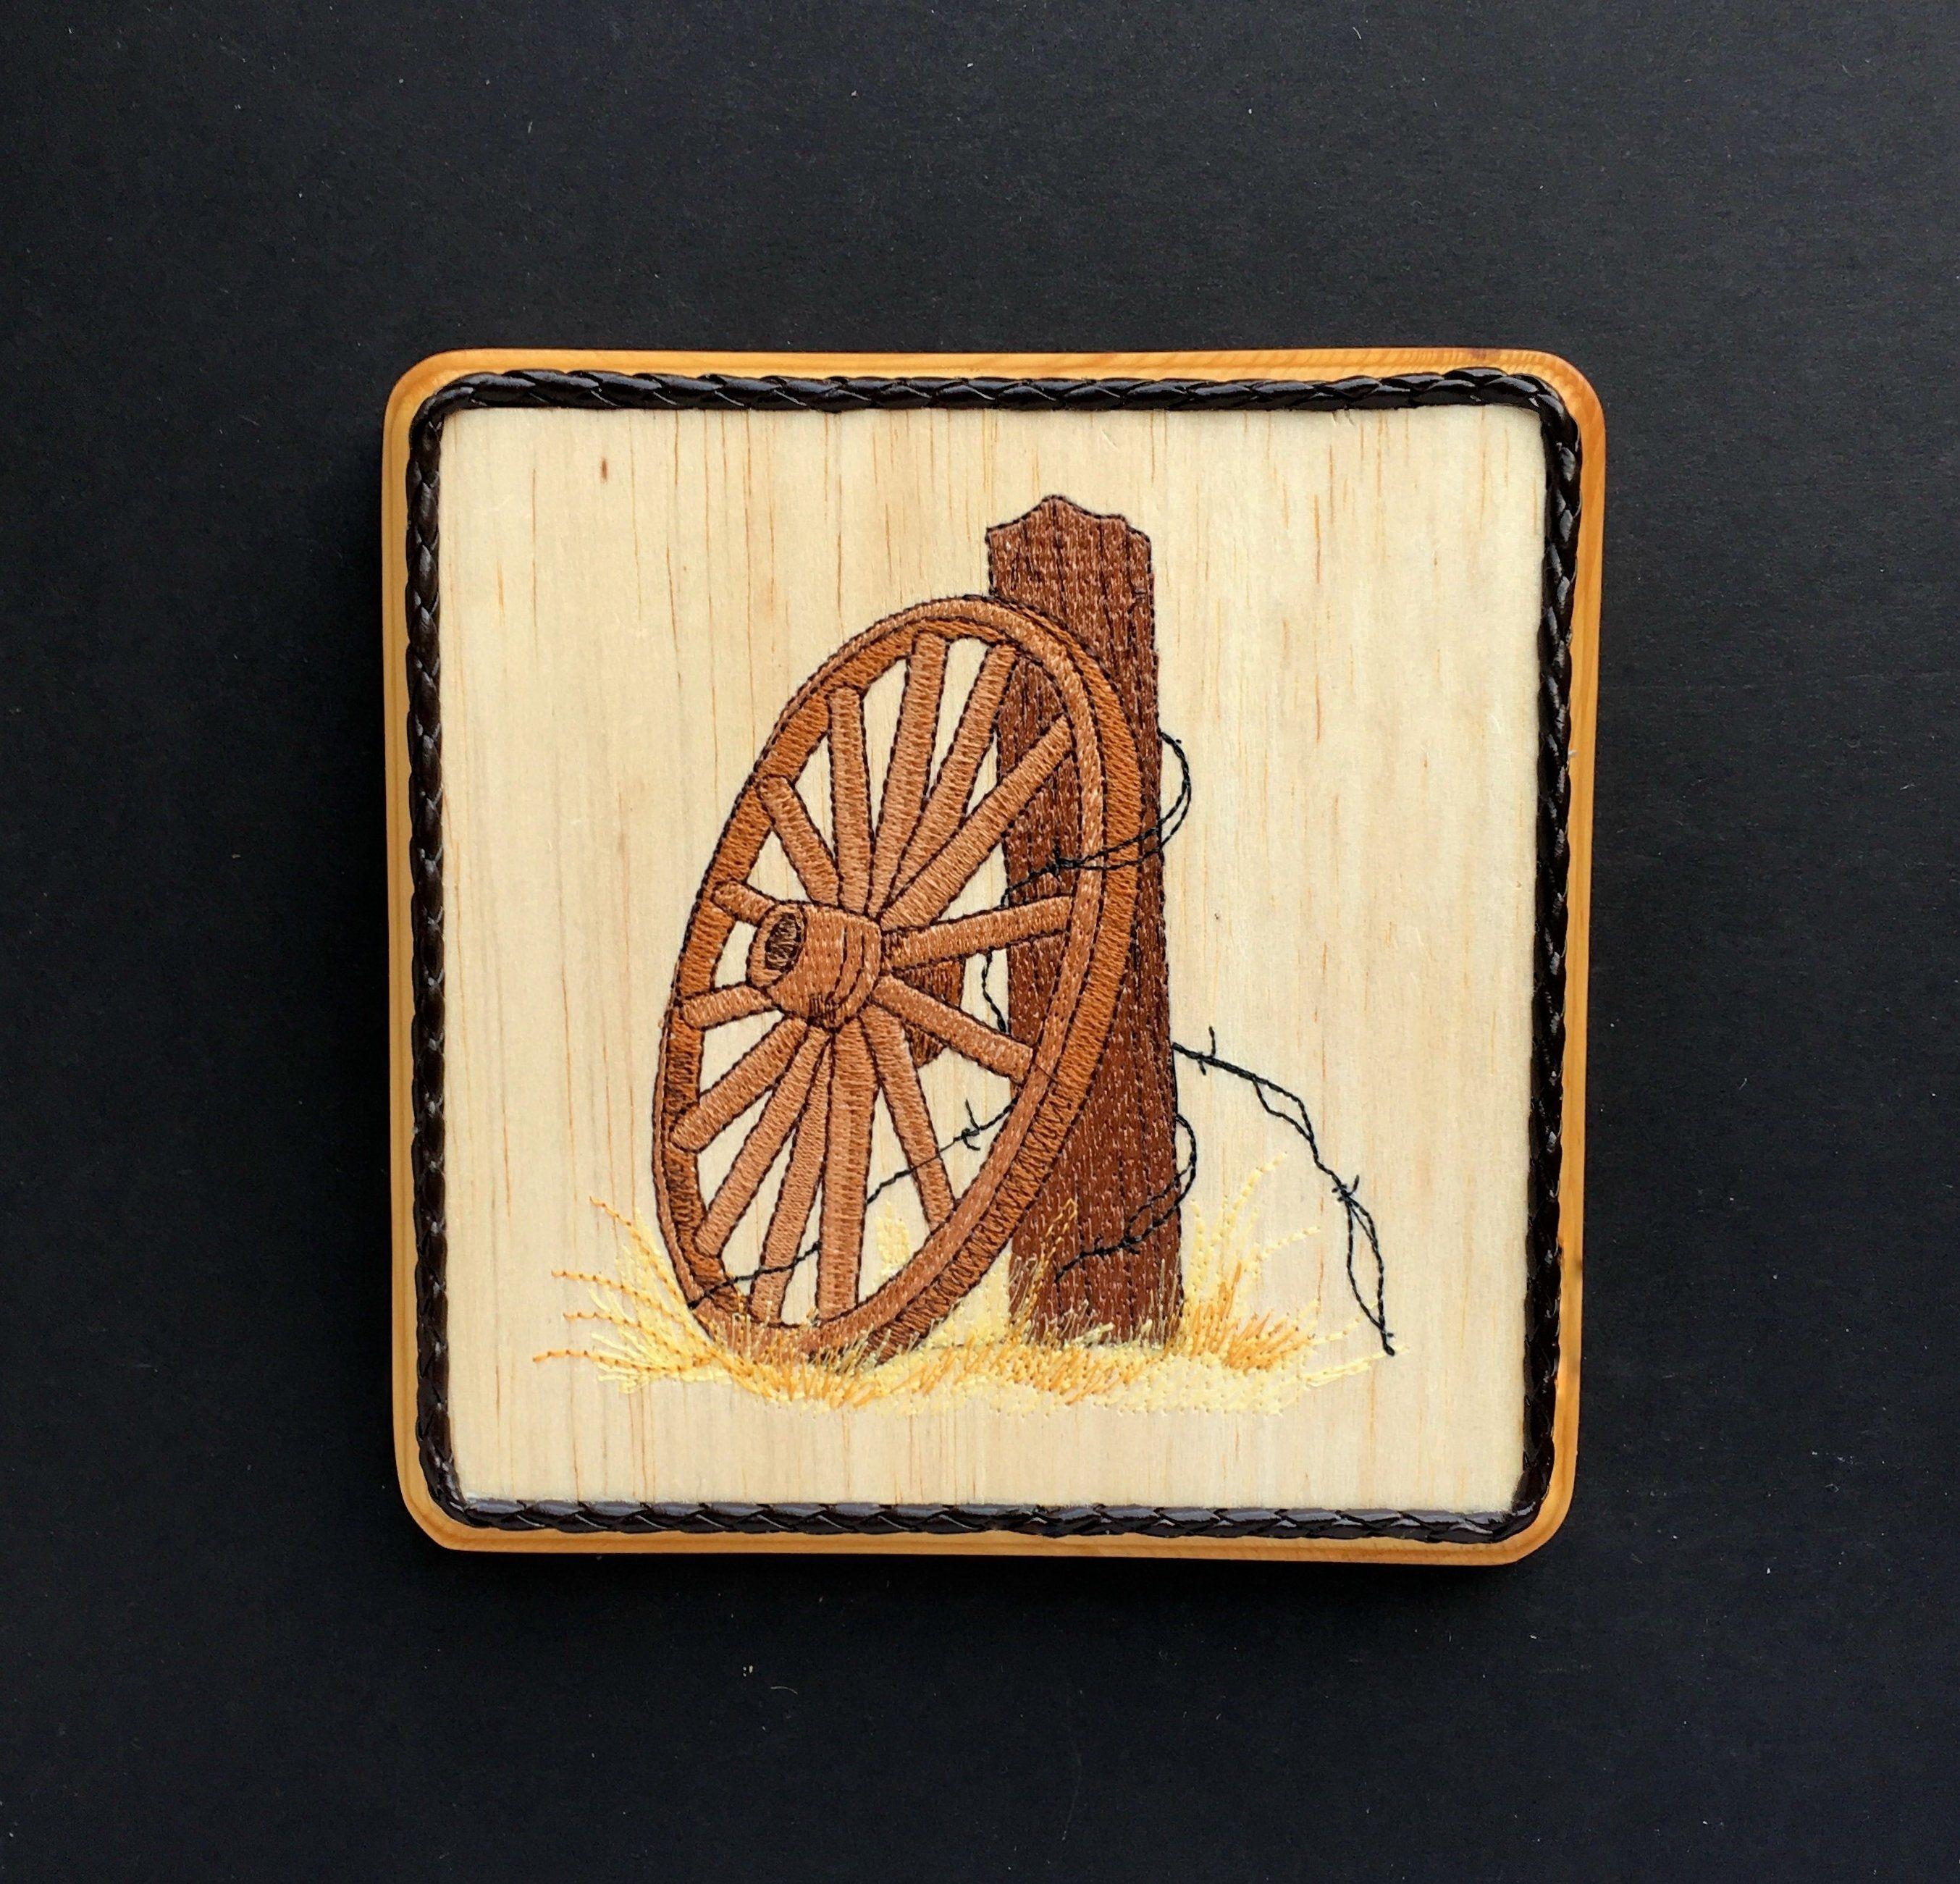 Wooden Wagon Wheel Wall Decor, Balsa Wood Embroidery Art, Prairie ...